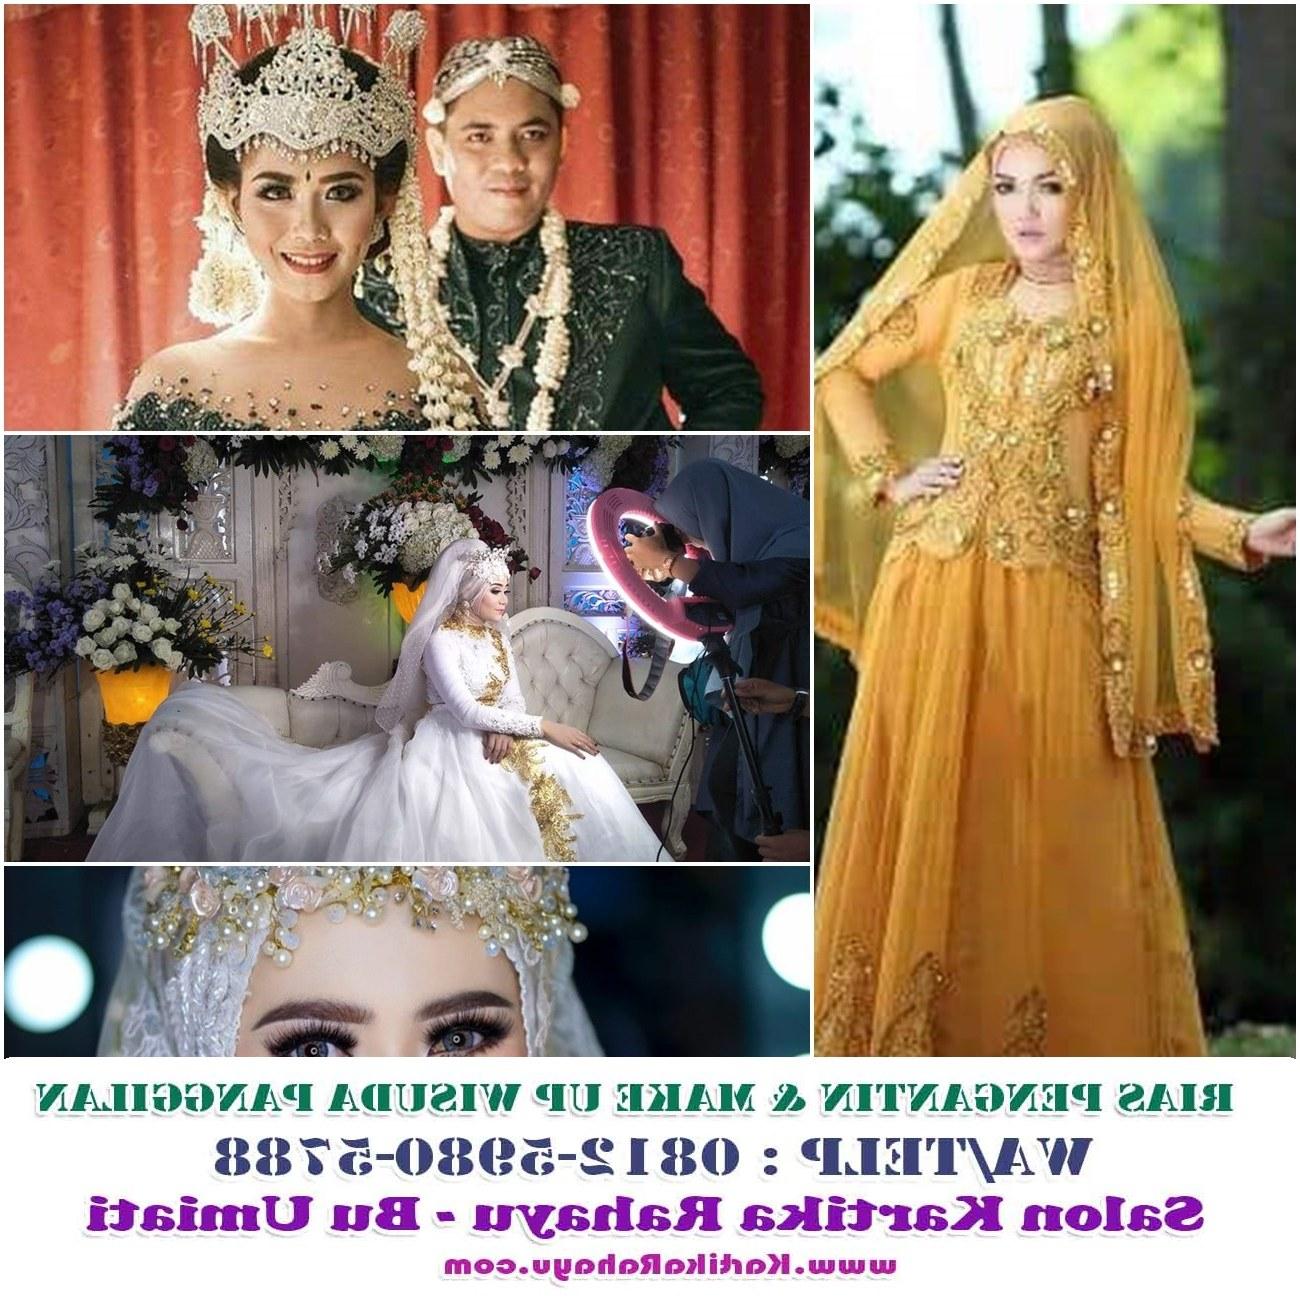 Ide Sewa Gaun Pengantin Muslimah Malang Nkde Wedding Package Malang Terbaik Rekomendasi